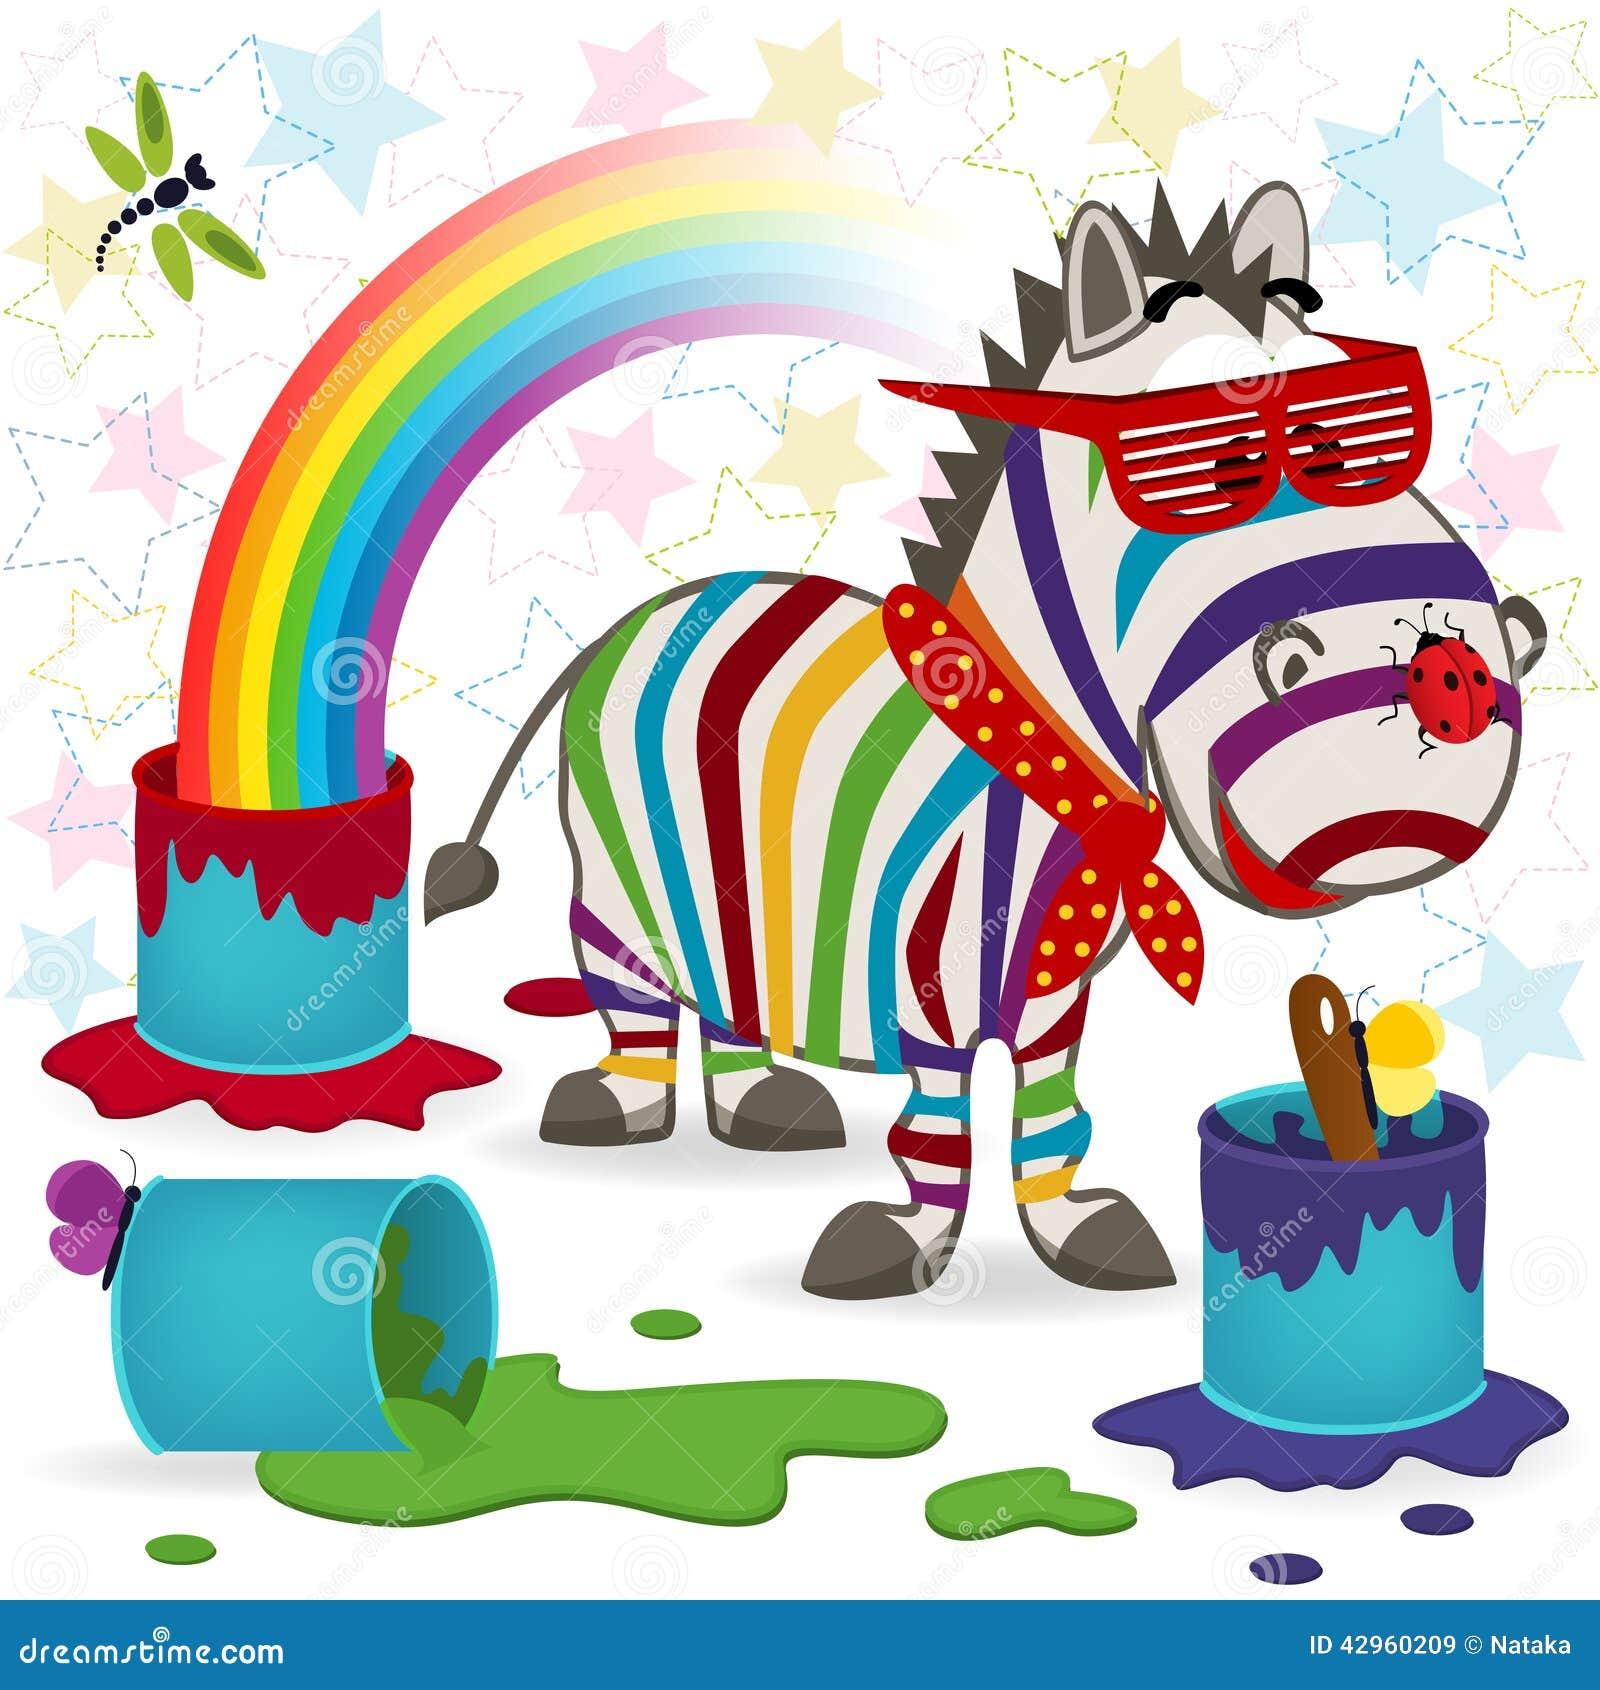 Rainbow Zebra Stock Vector Illustration Of Wallpaper 42960209